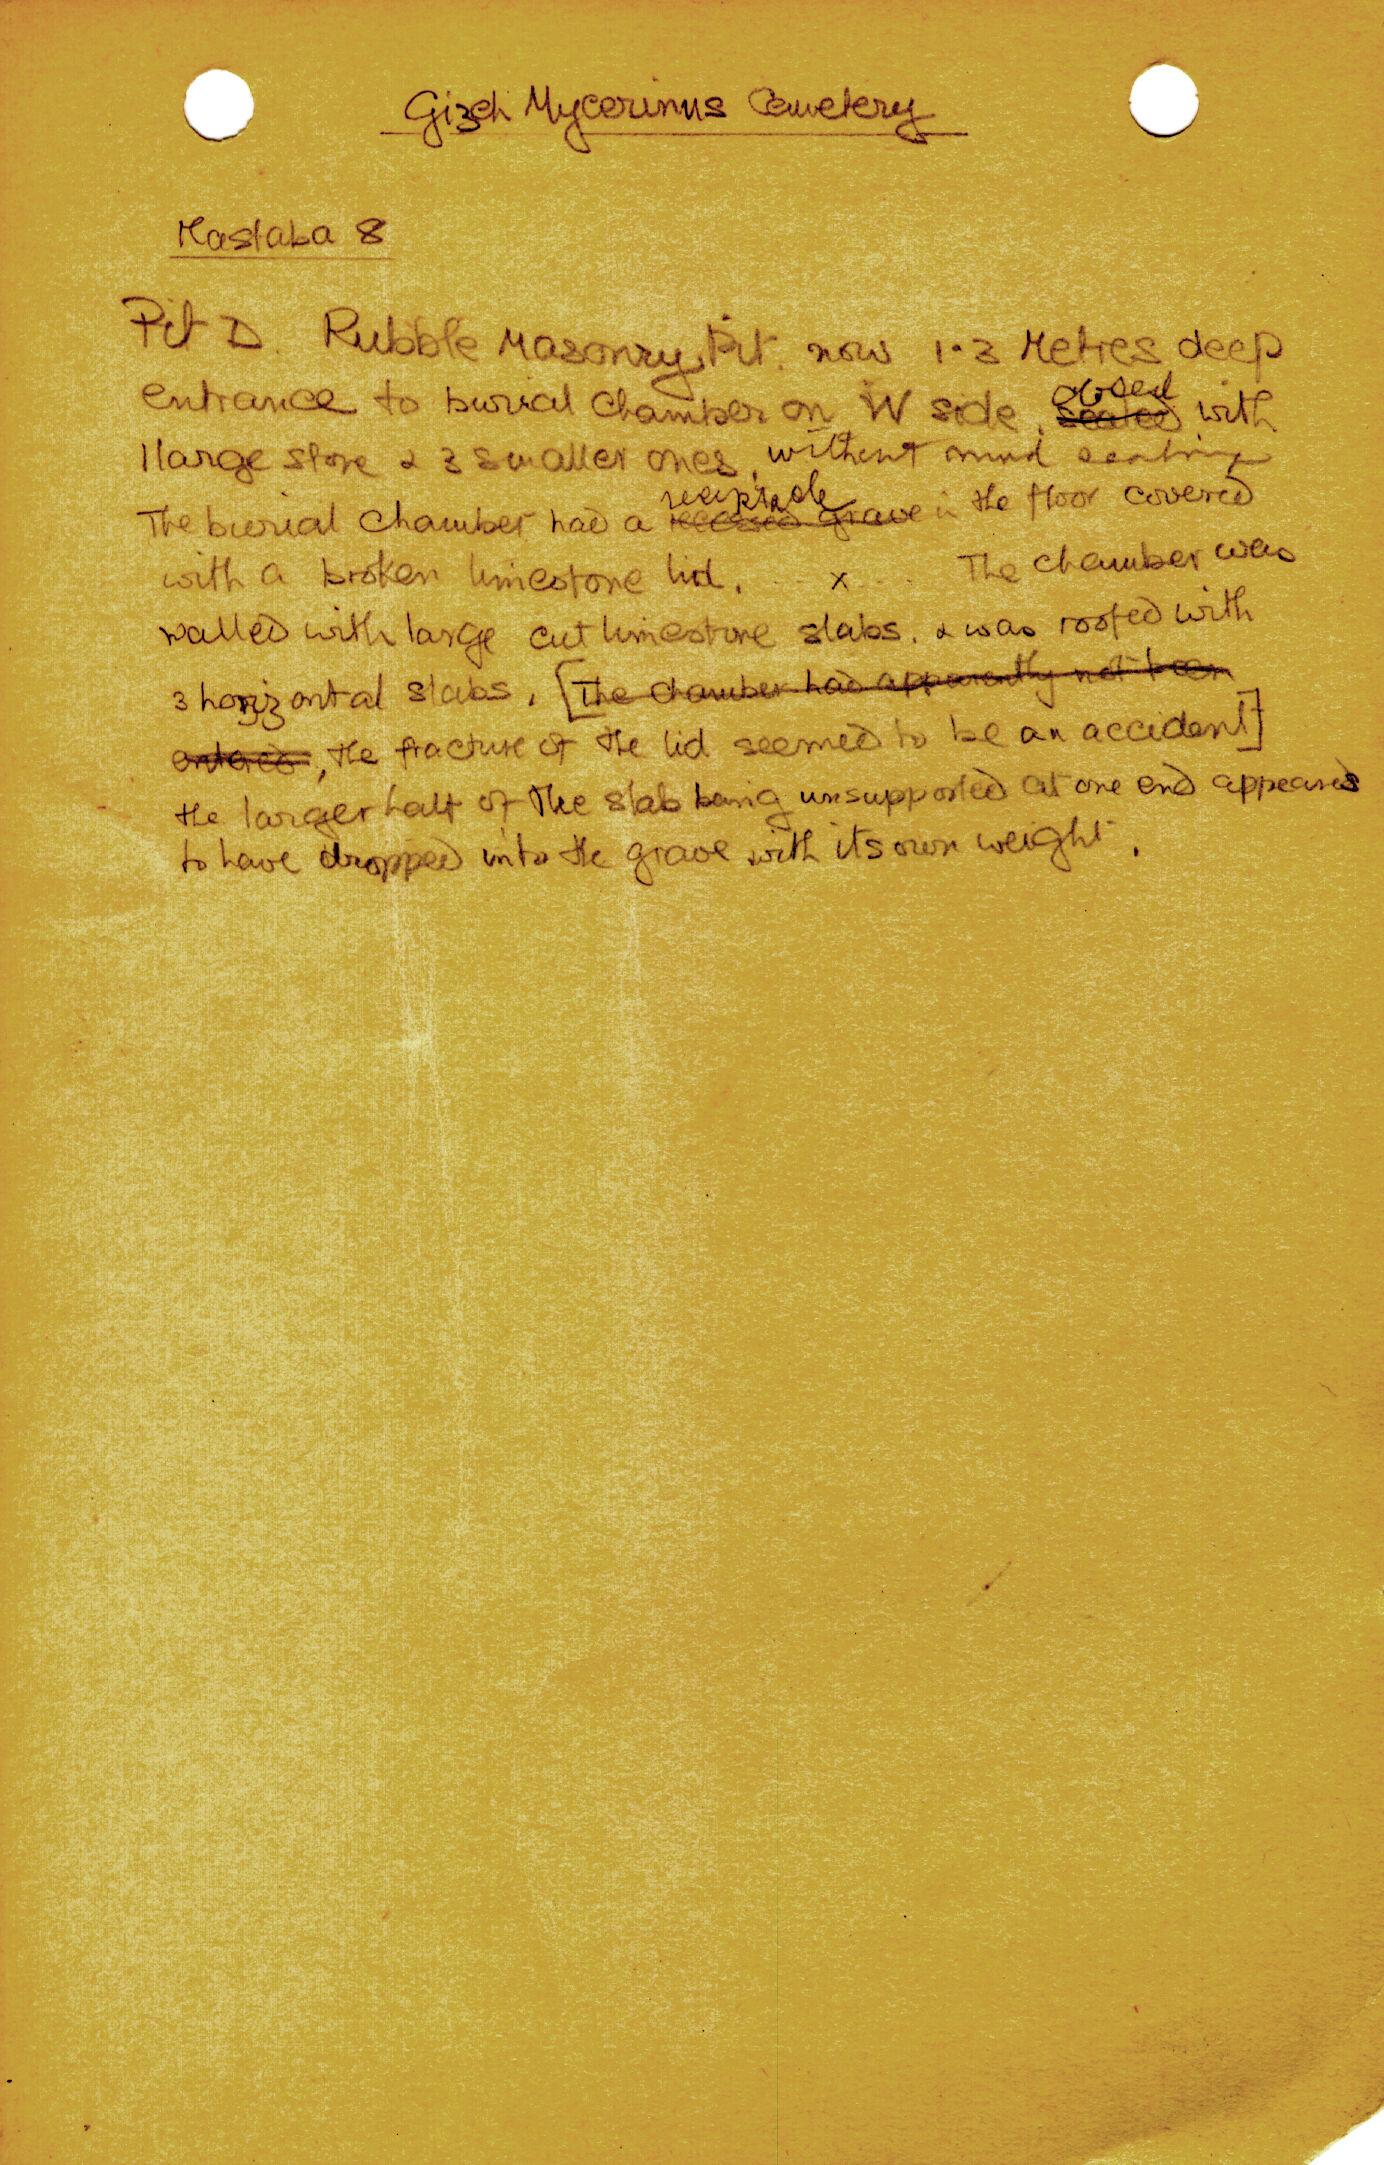 Notes: MQ 8, Shaft D, notes